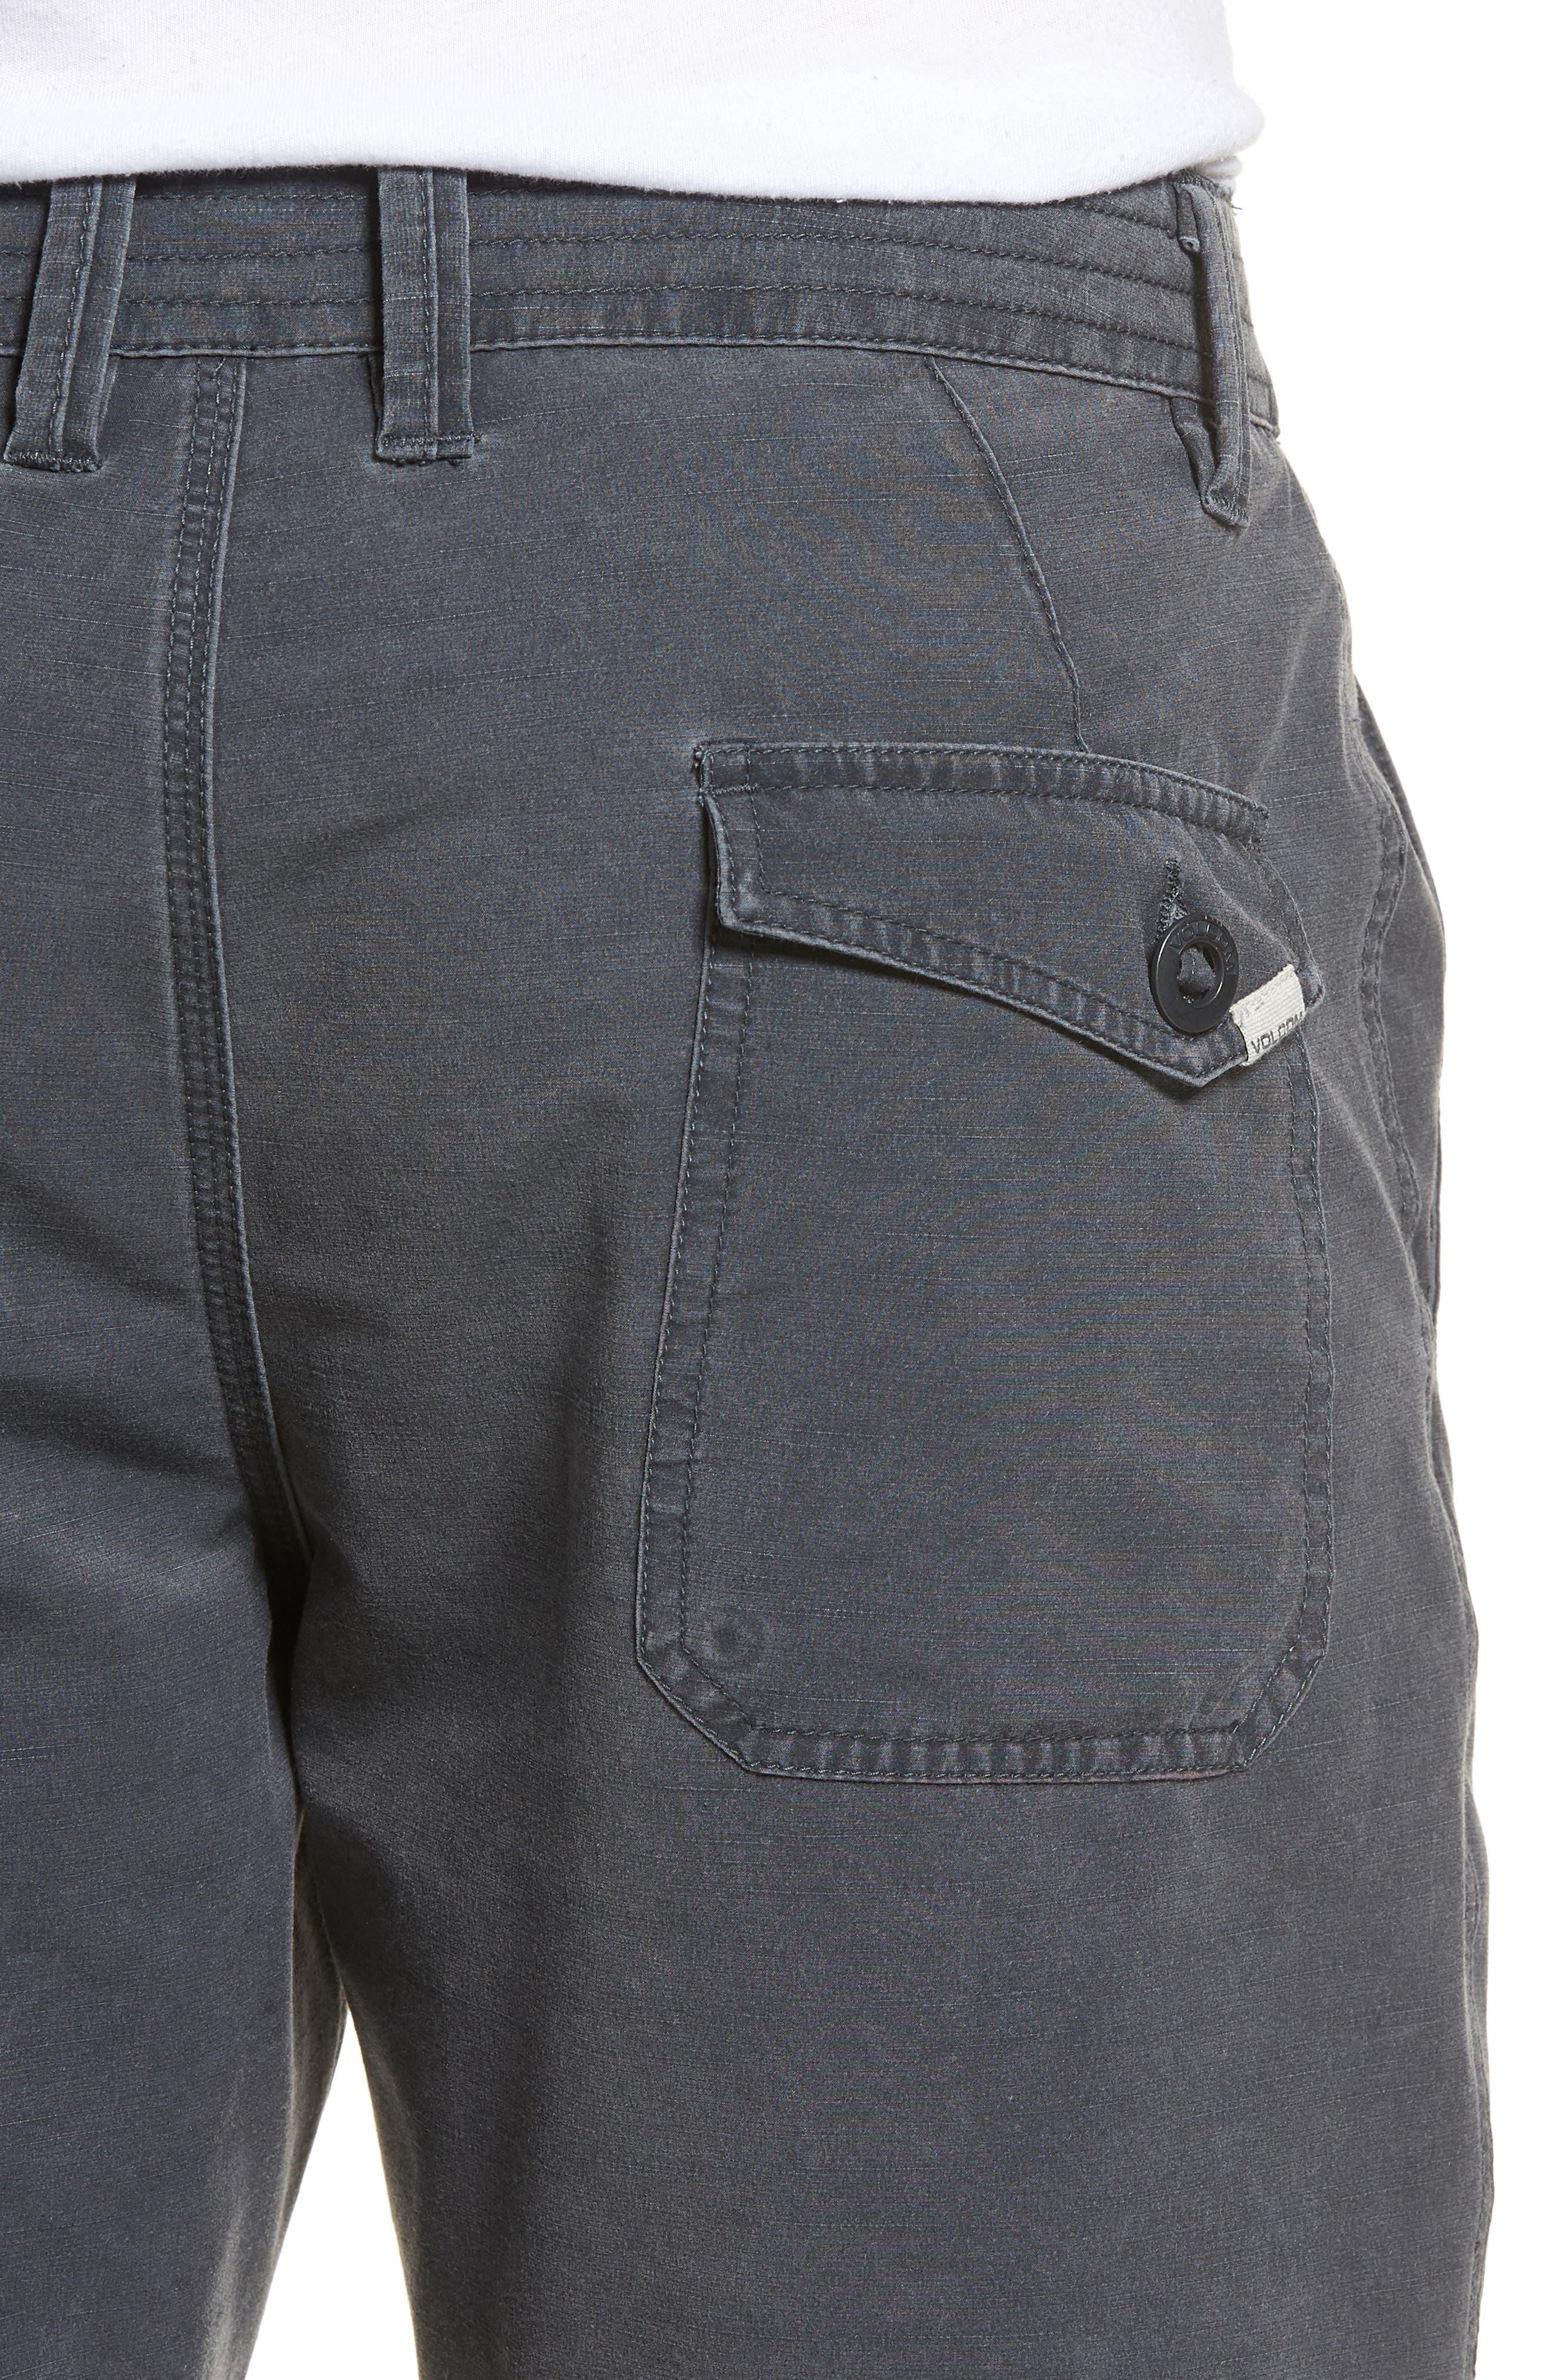 Surf N' Turf Hybrid Shorts,                             Alternate thumbnail 4, color,                             025